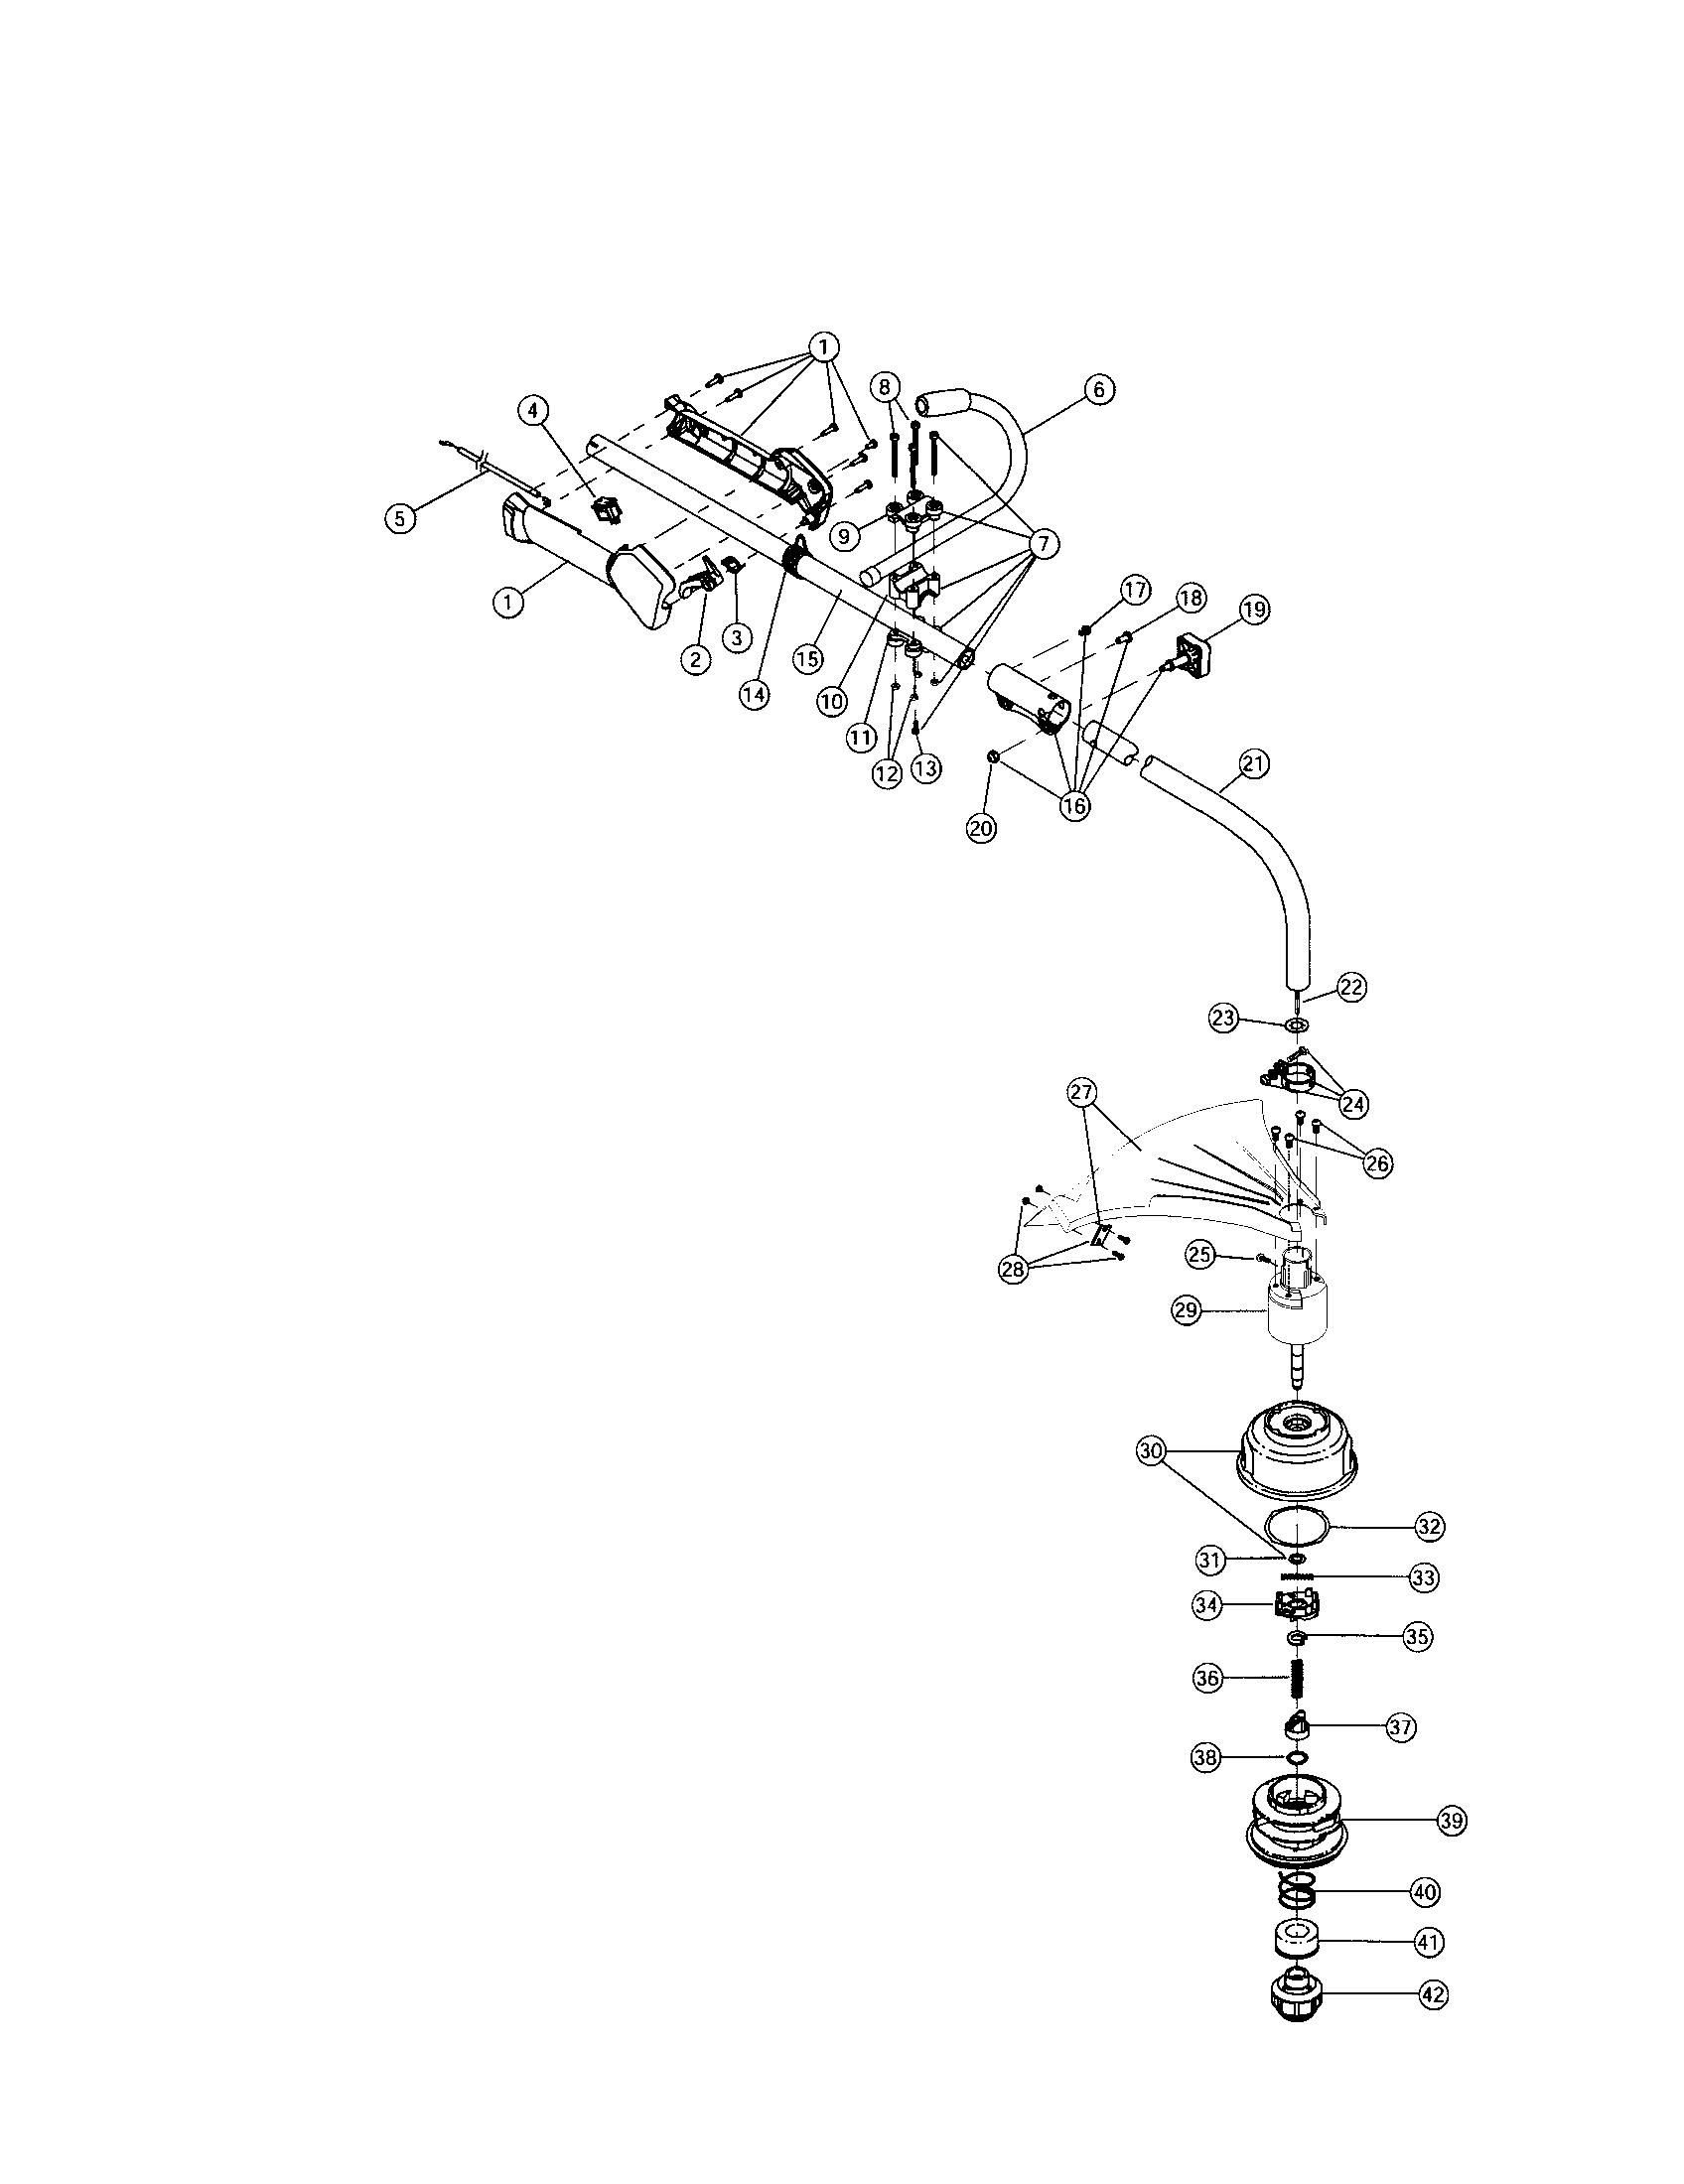 Ryobi 26cc Fuel Line Diagram Ryobi 725R Replacement Parts